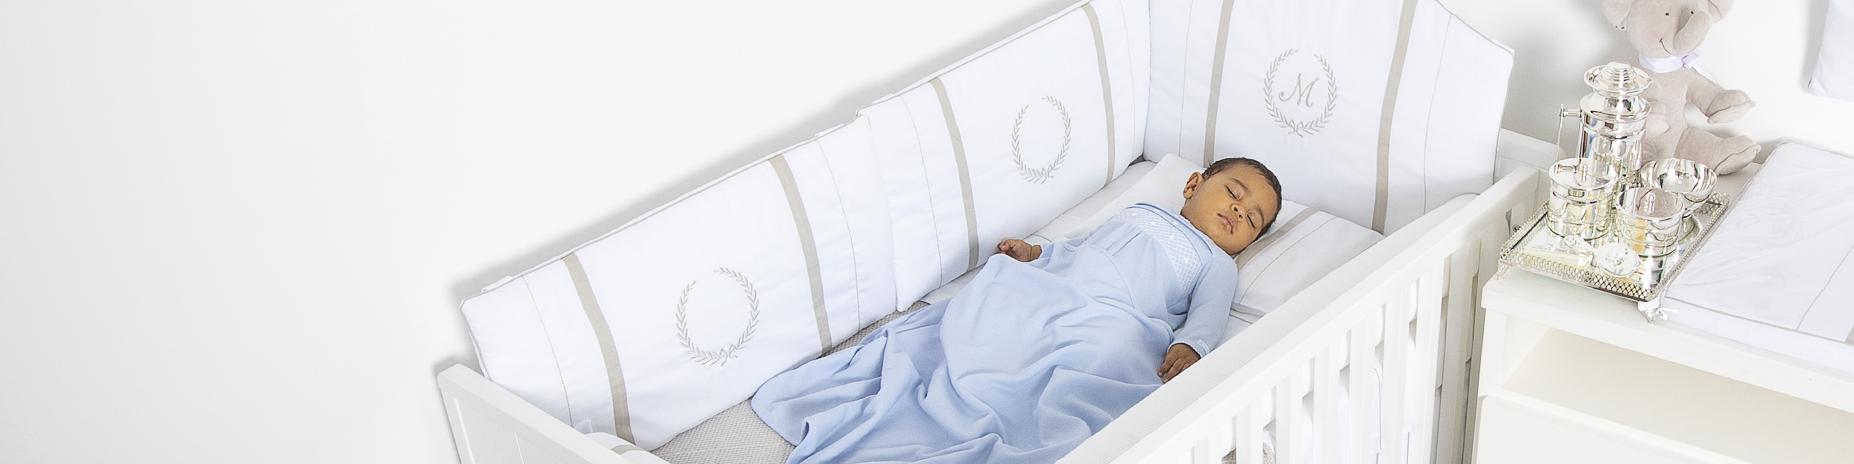 Maternidade cama